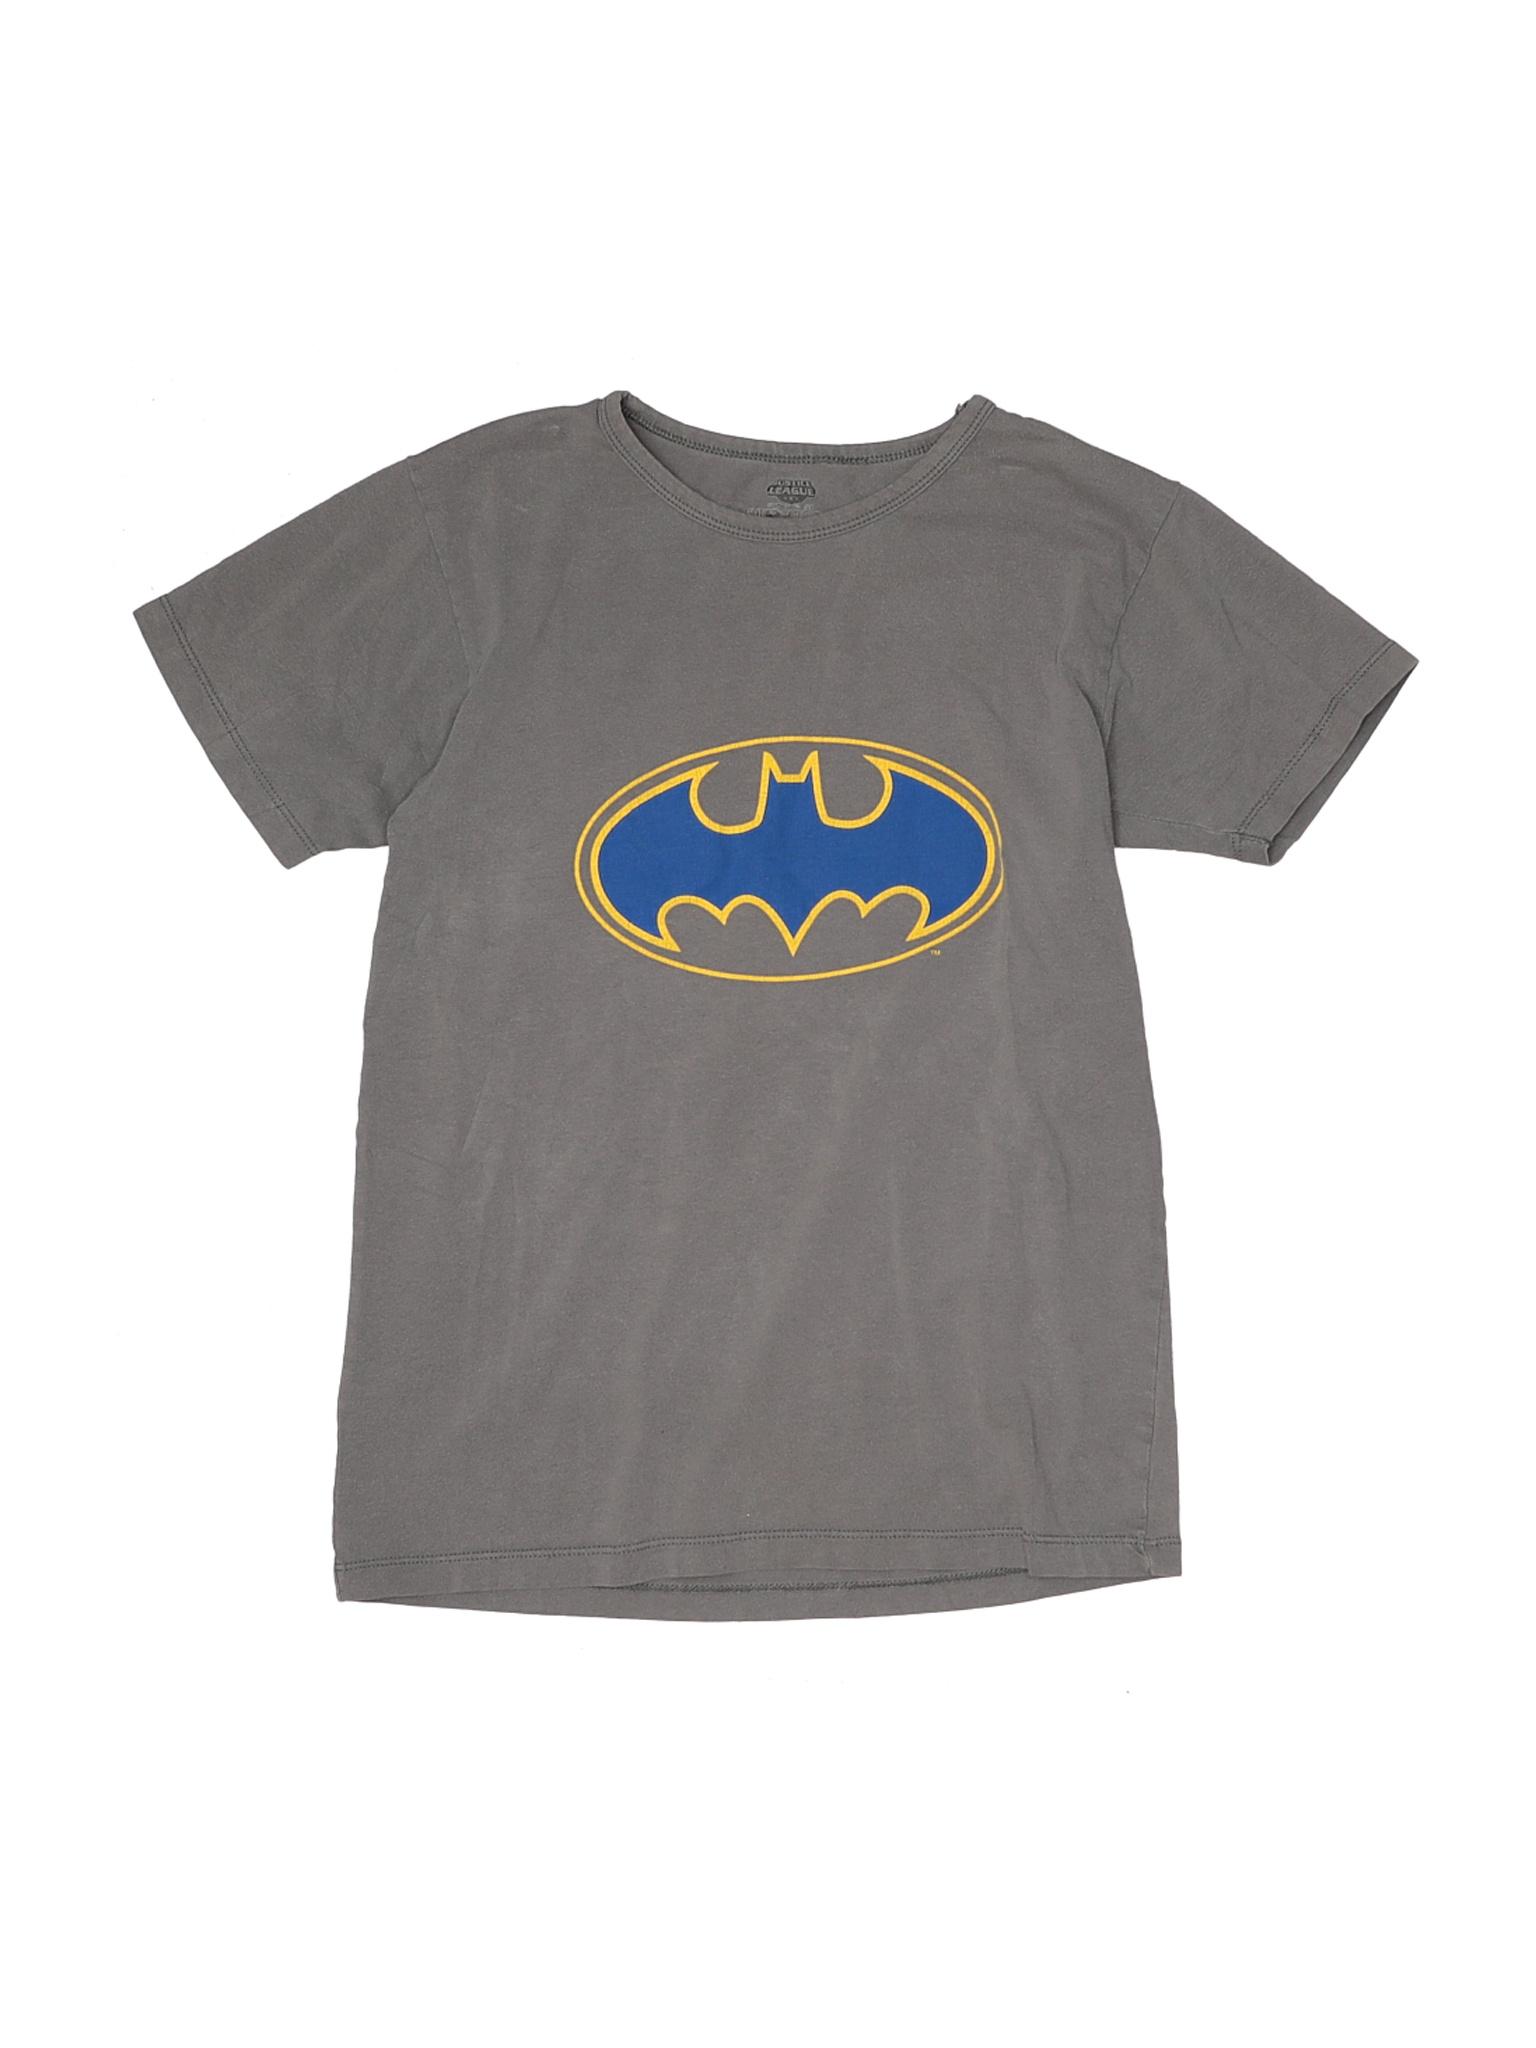 Shazam Boys T-Shirt Justice League Size Small 6//7 NEW